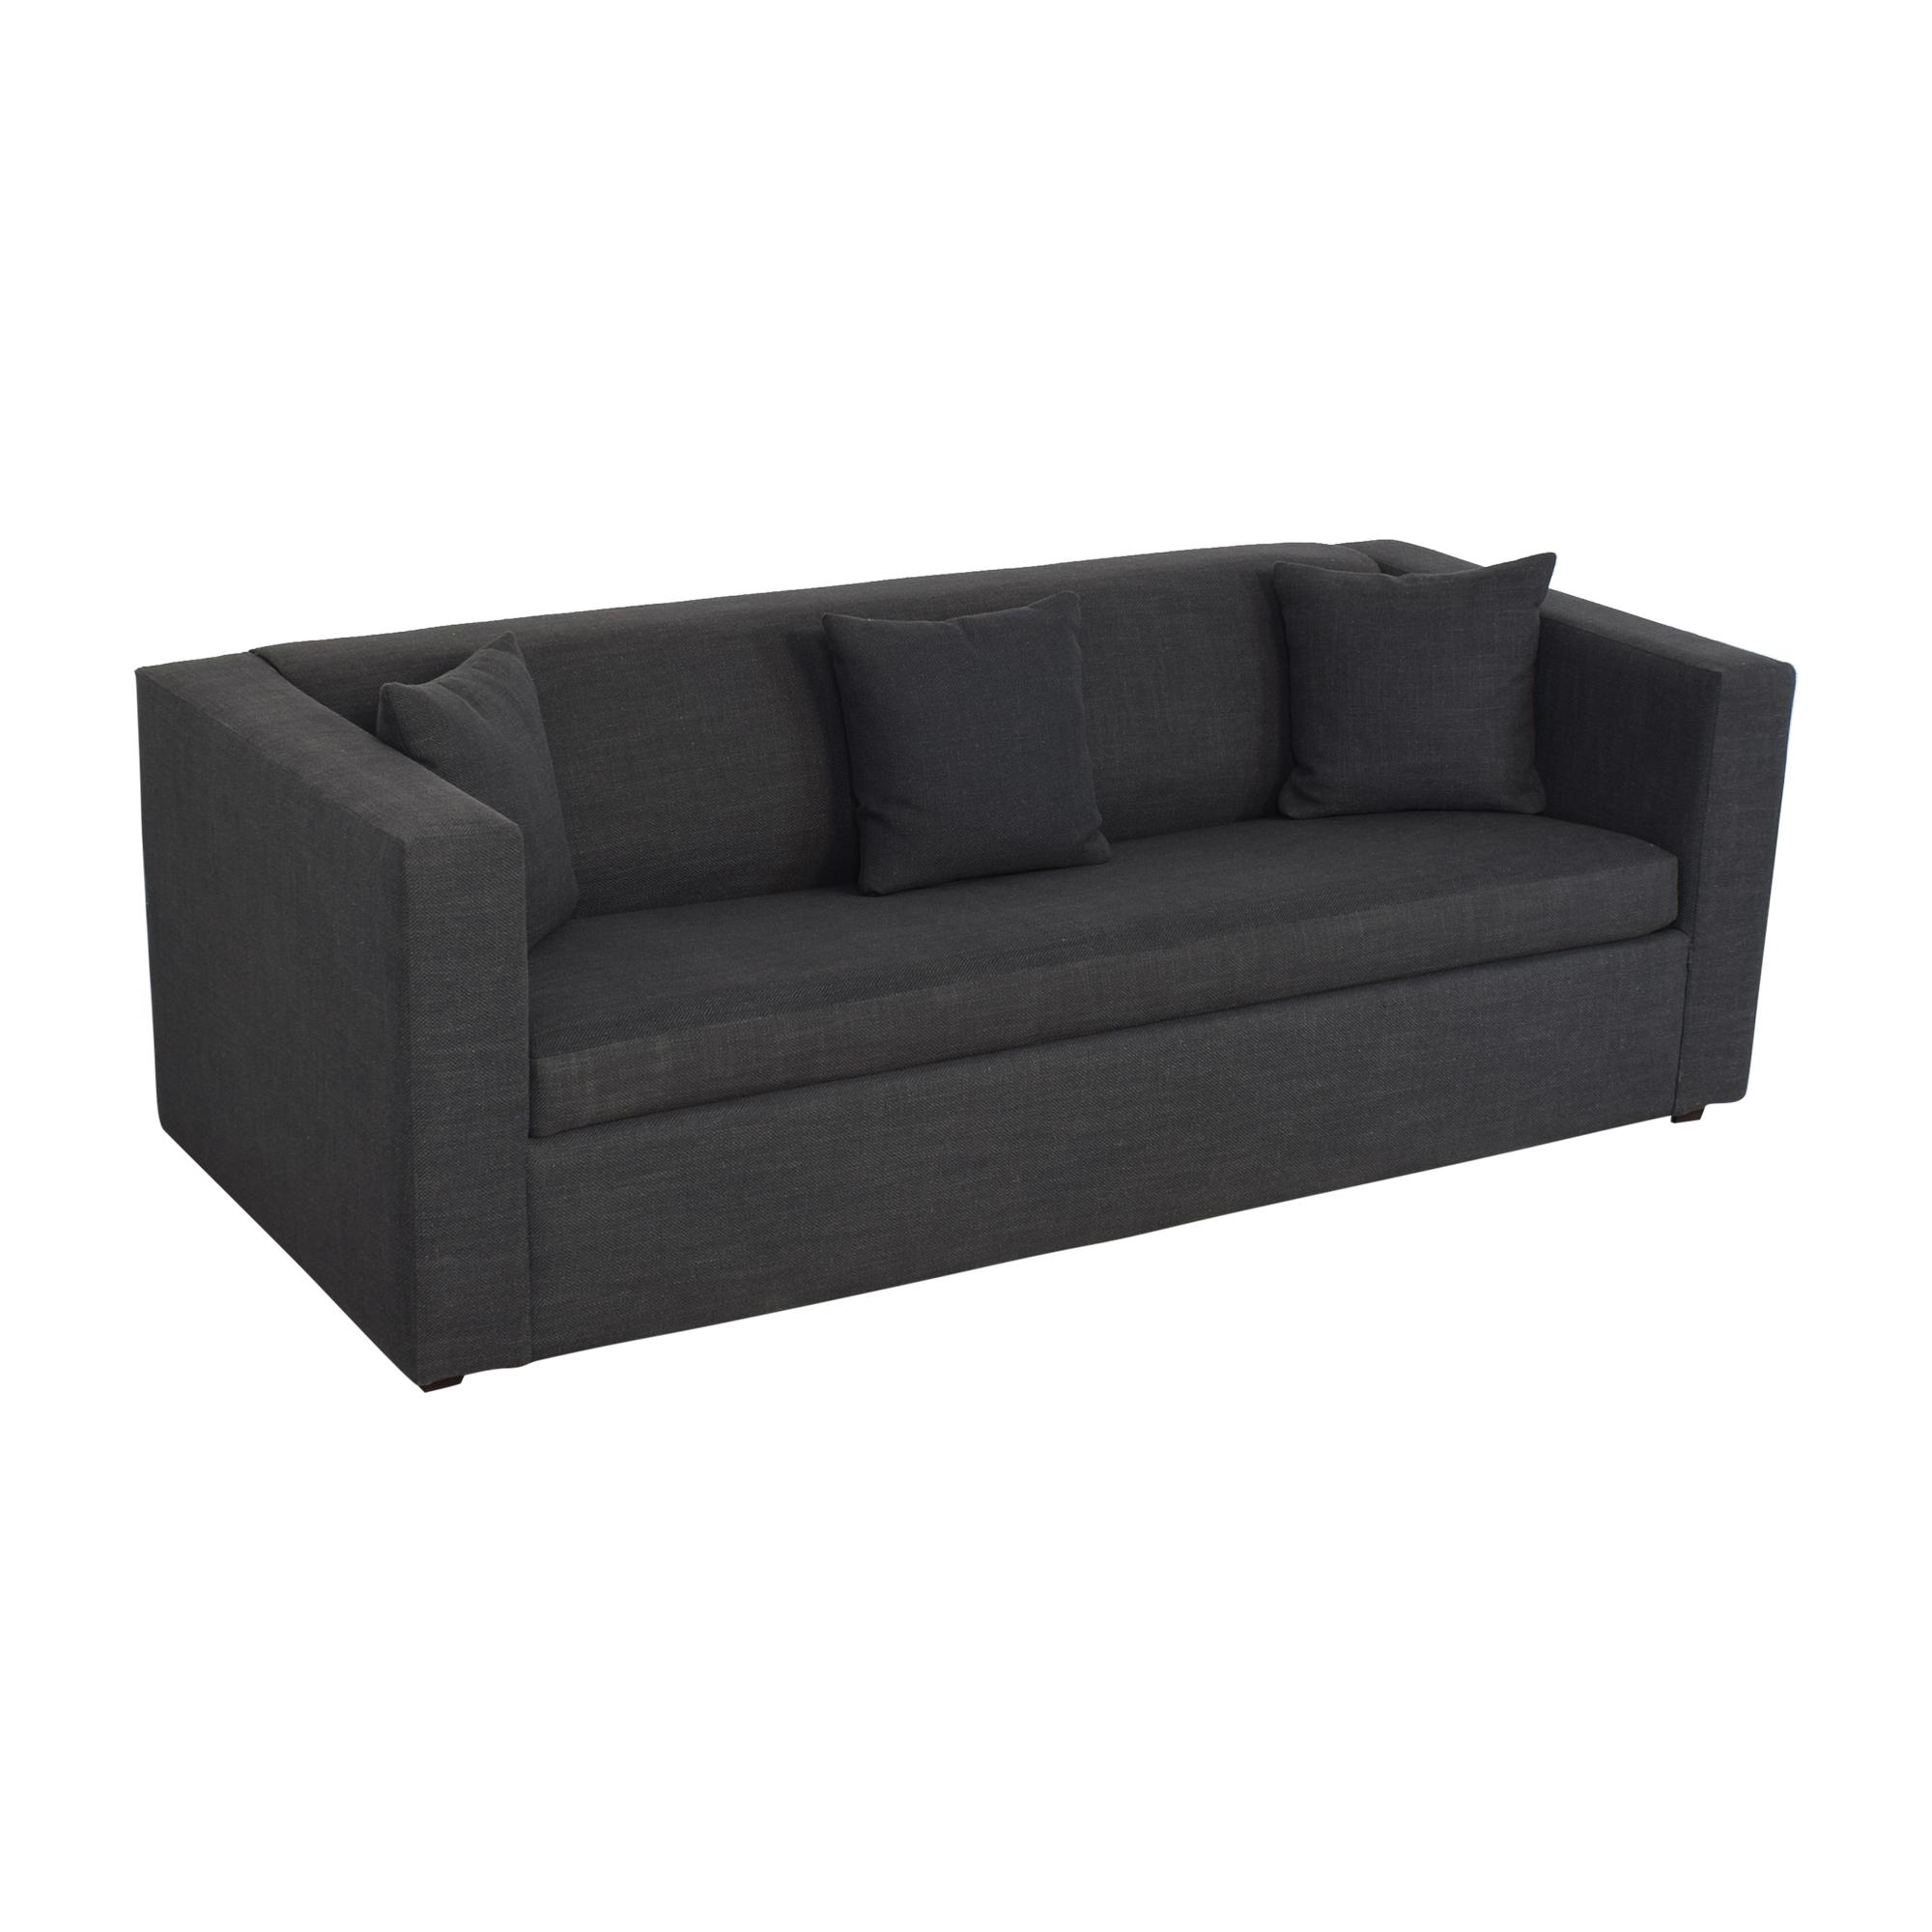 Blu Dot Blu Dot Mono Sleeper Sofa second hand